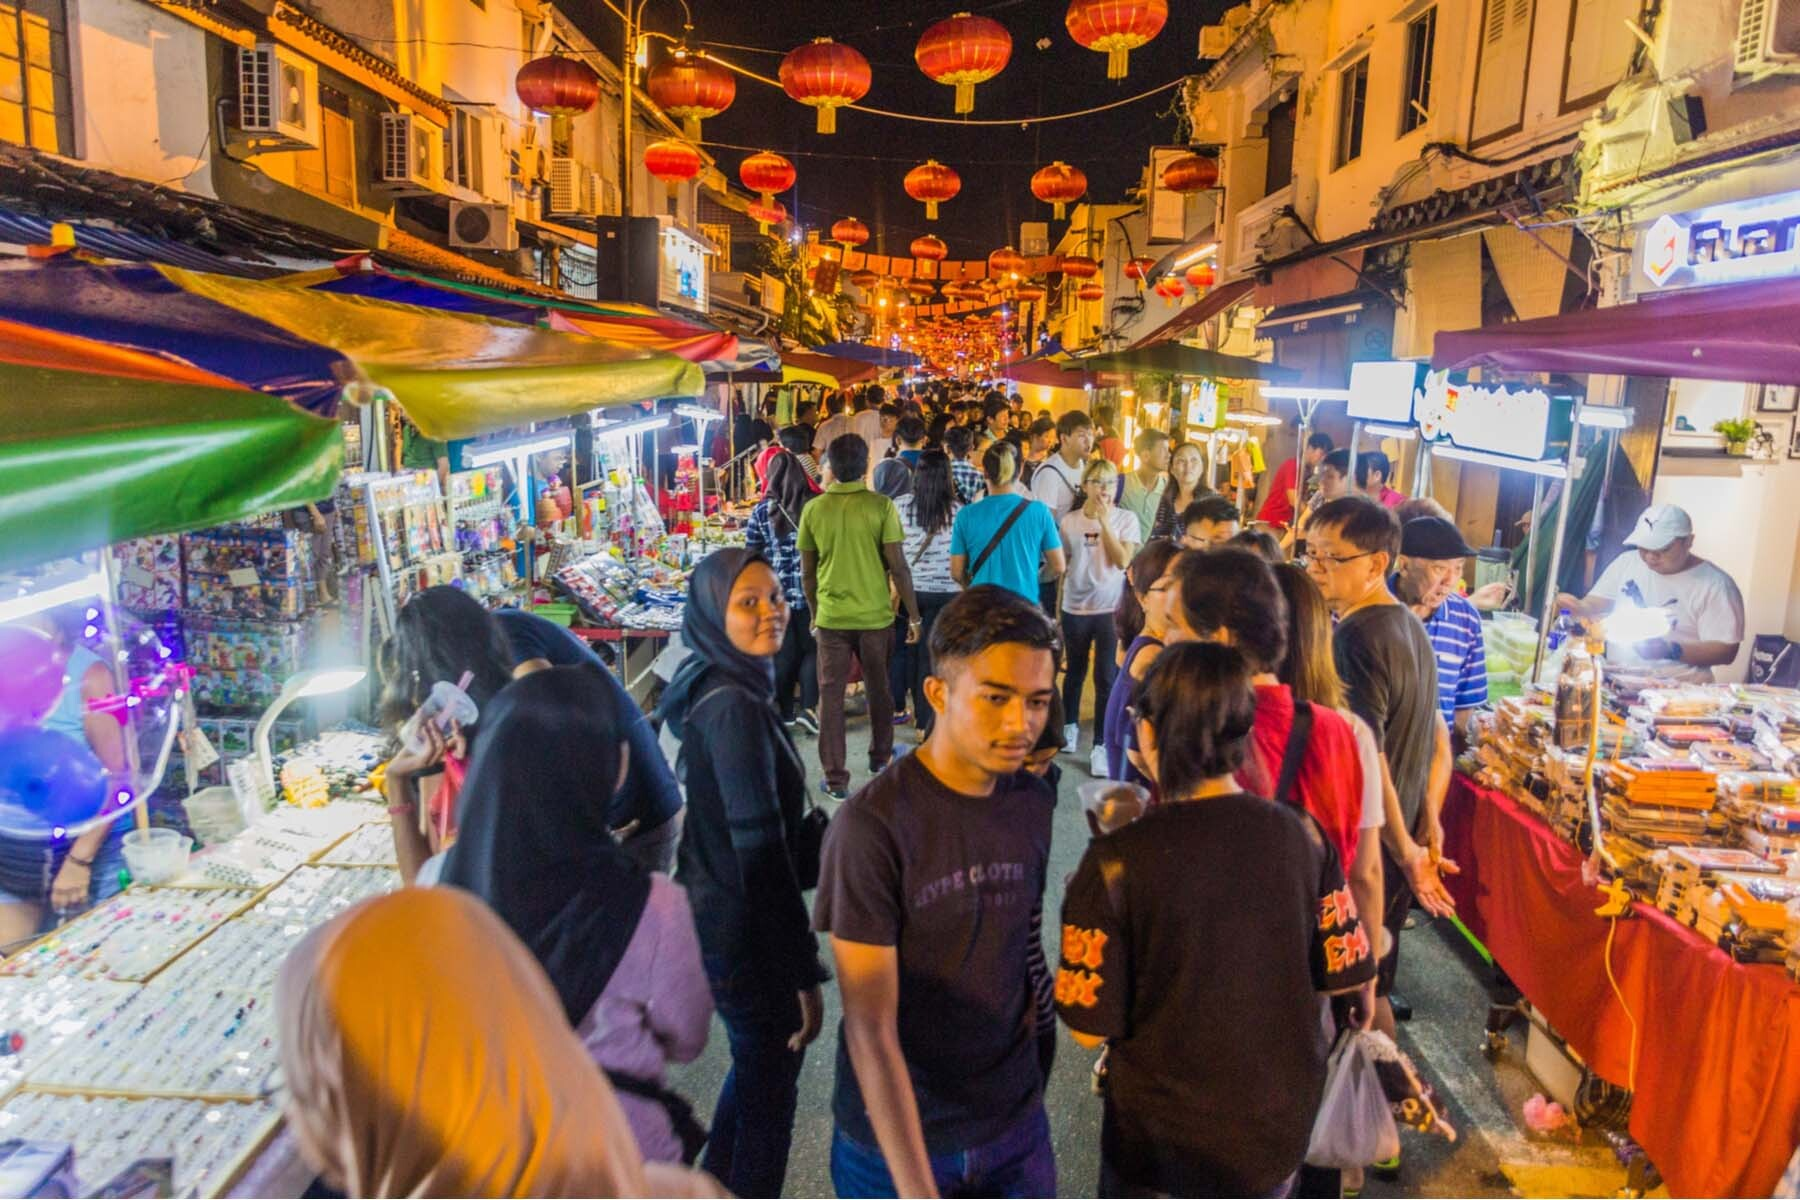 Night market in Melacca